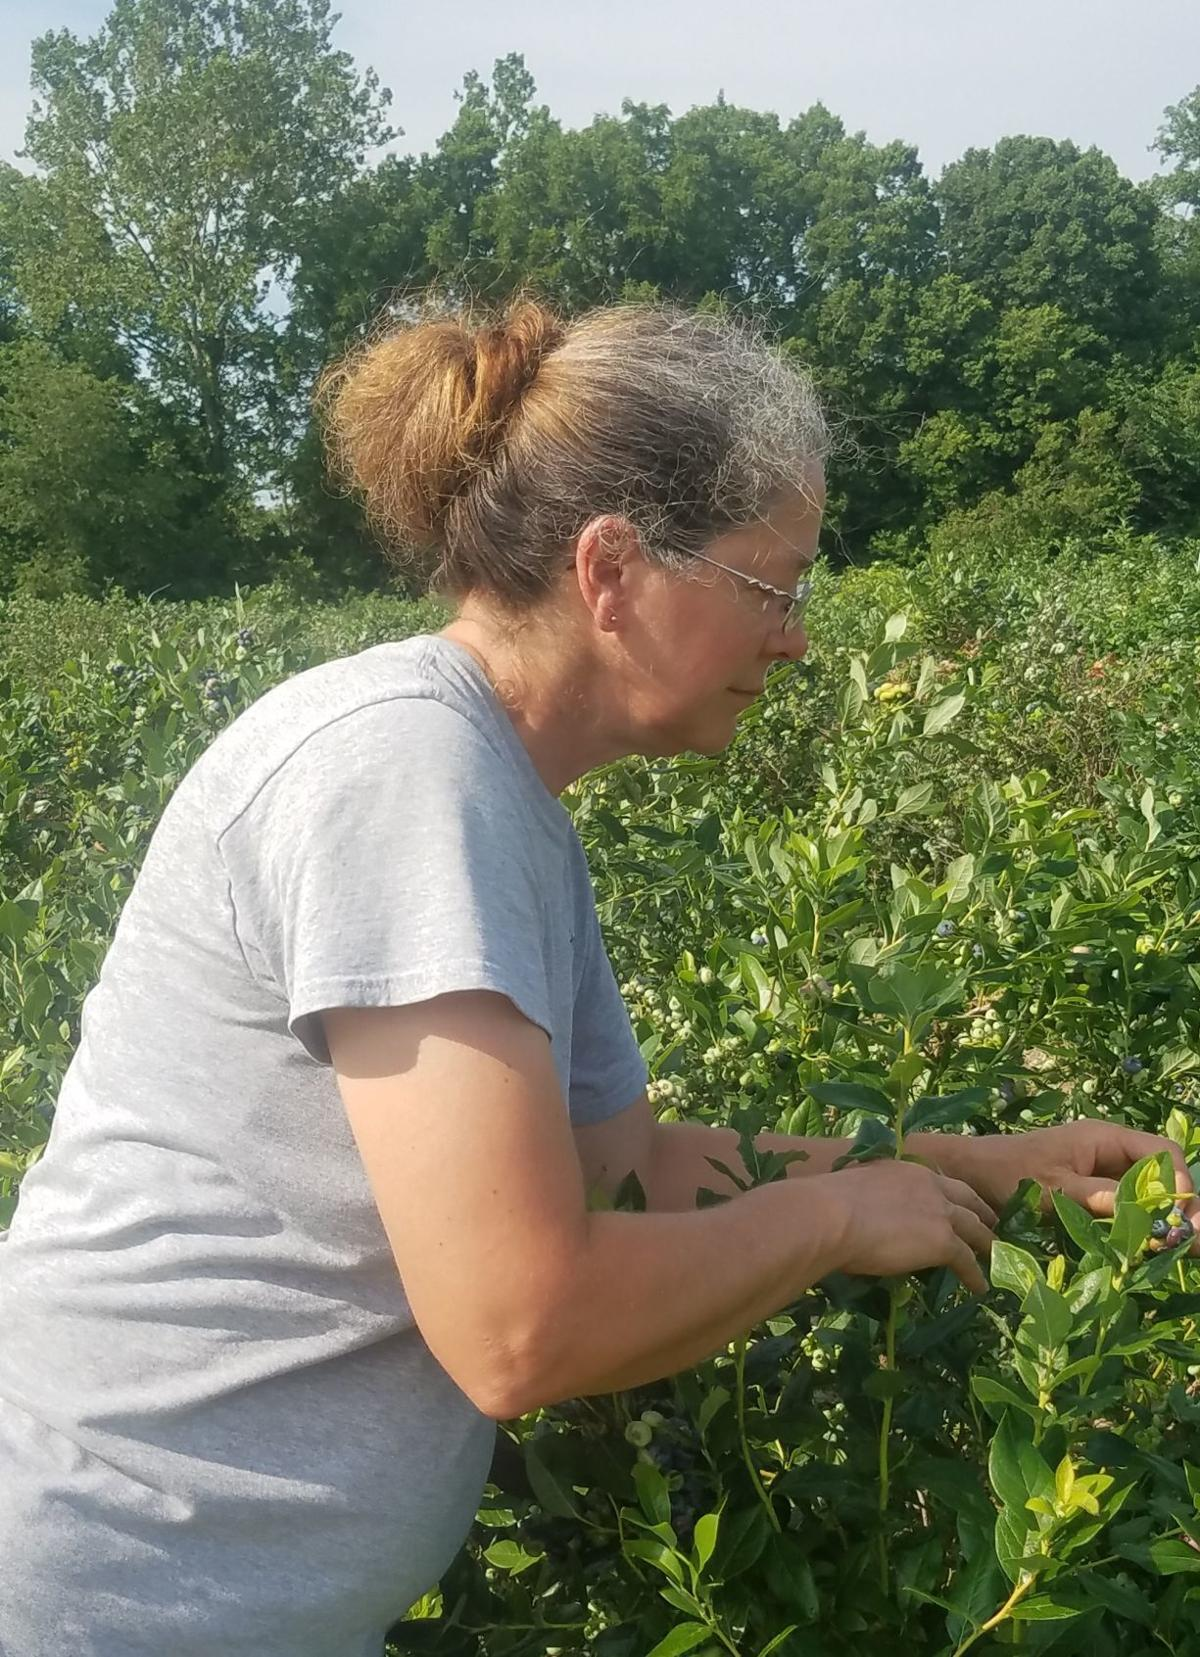 Hard work pays off at Cedar Creek Produce | Fwbusiness